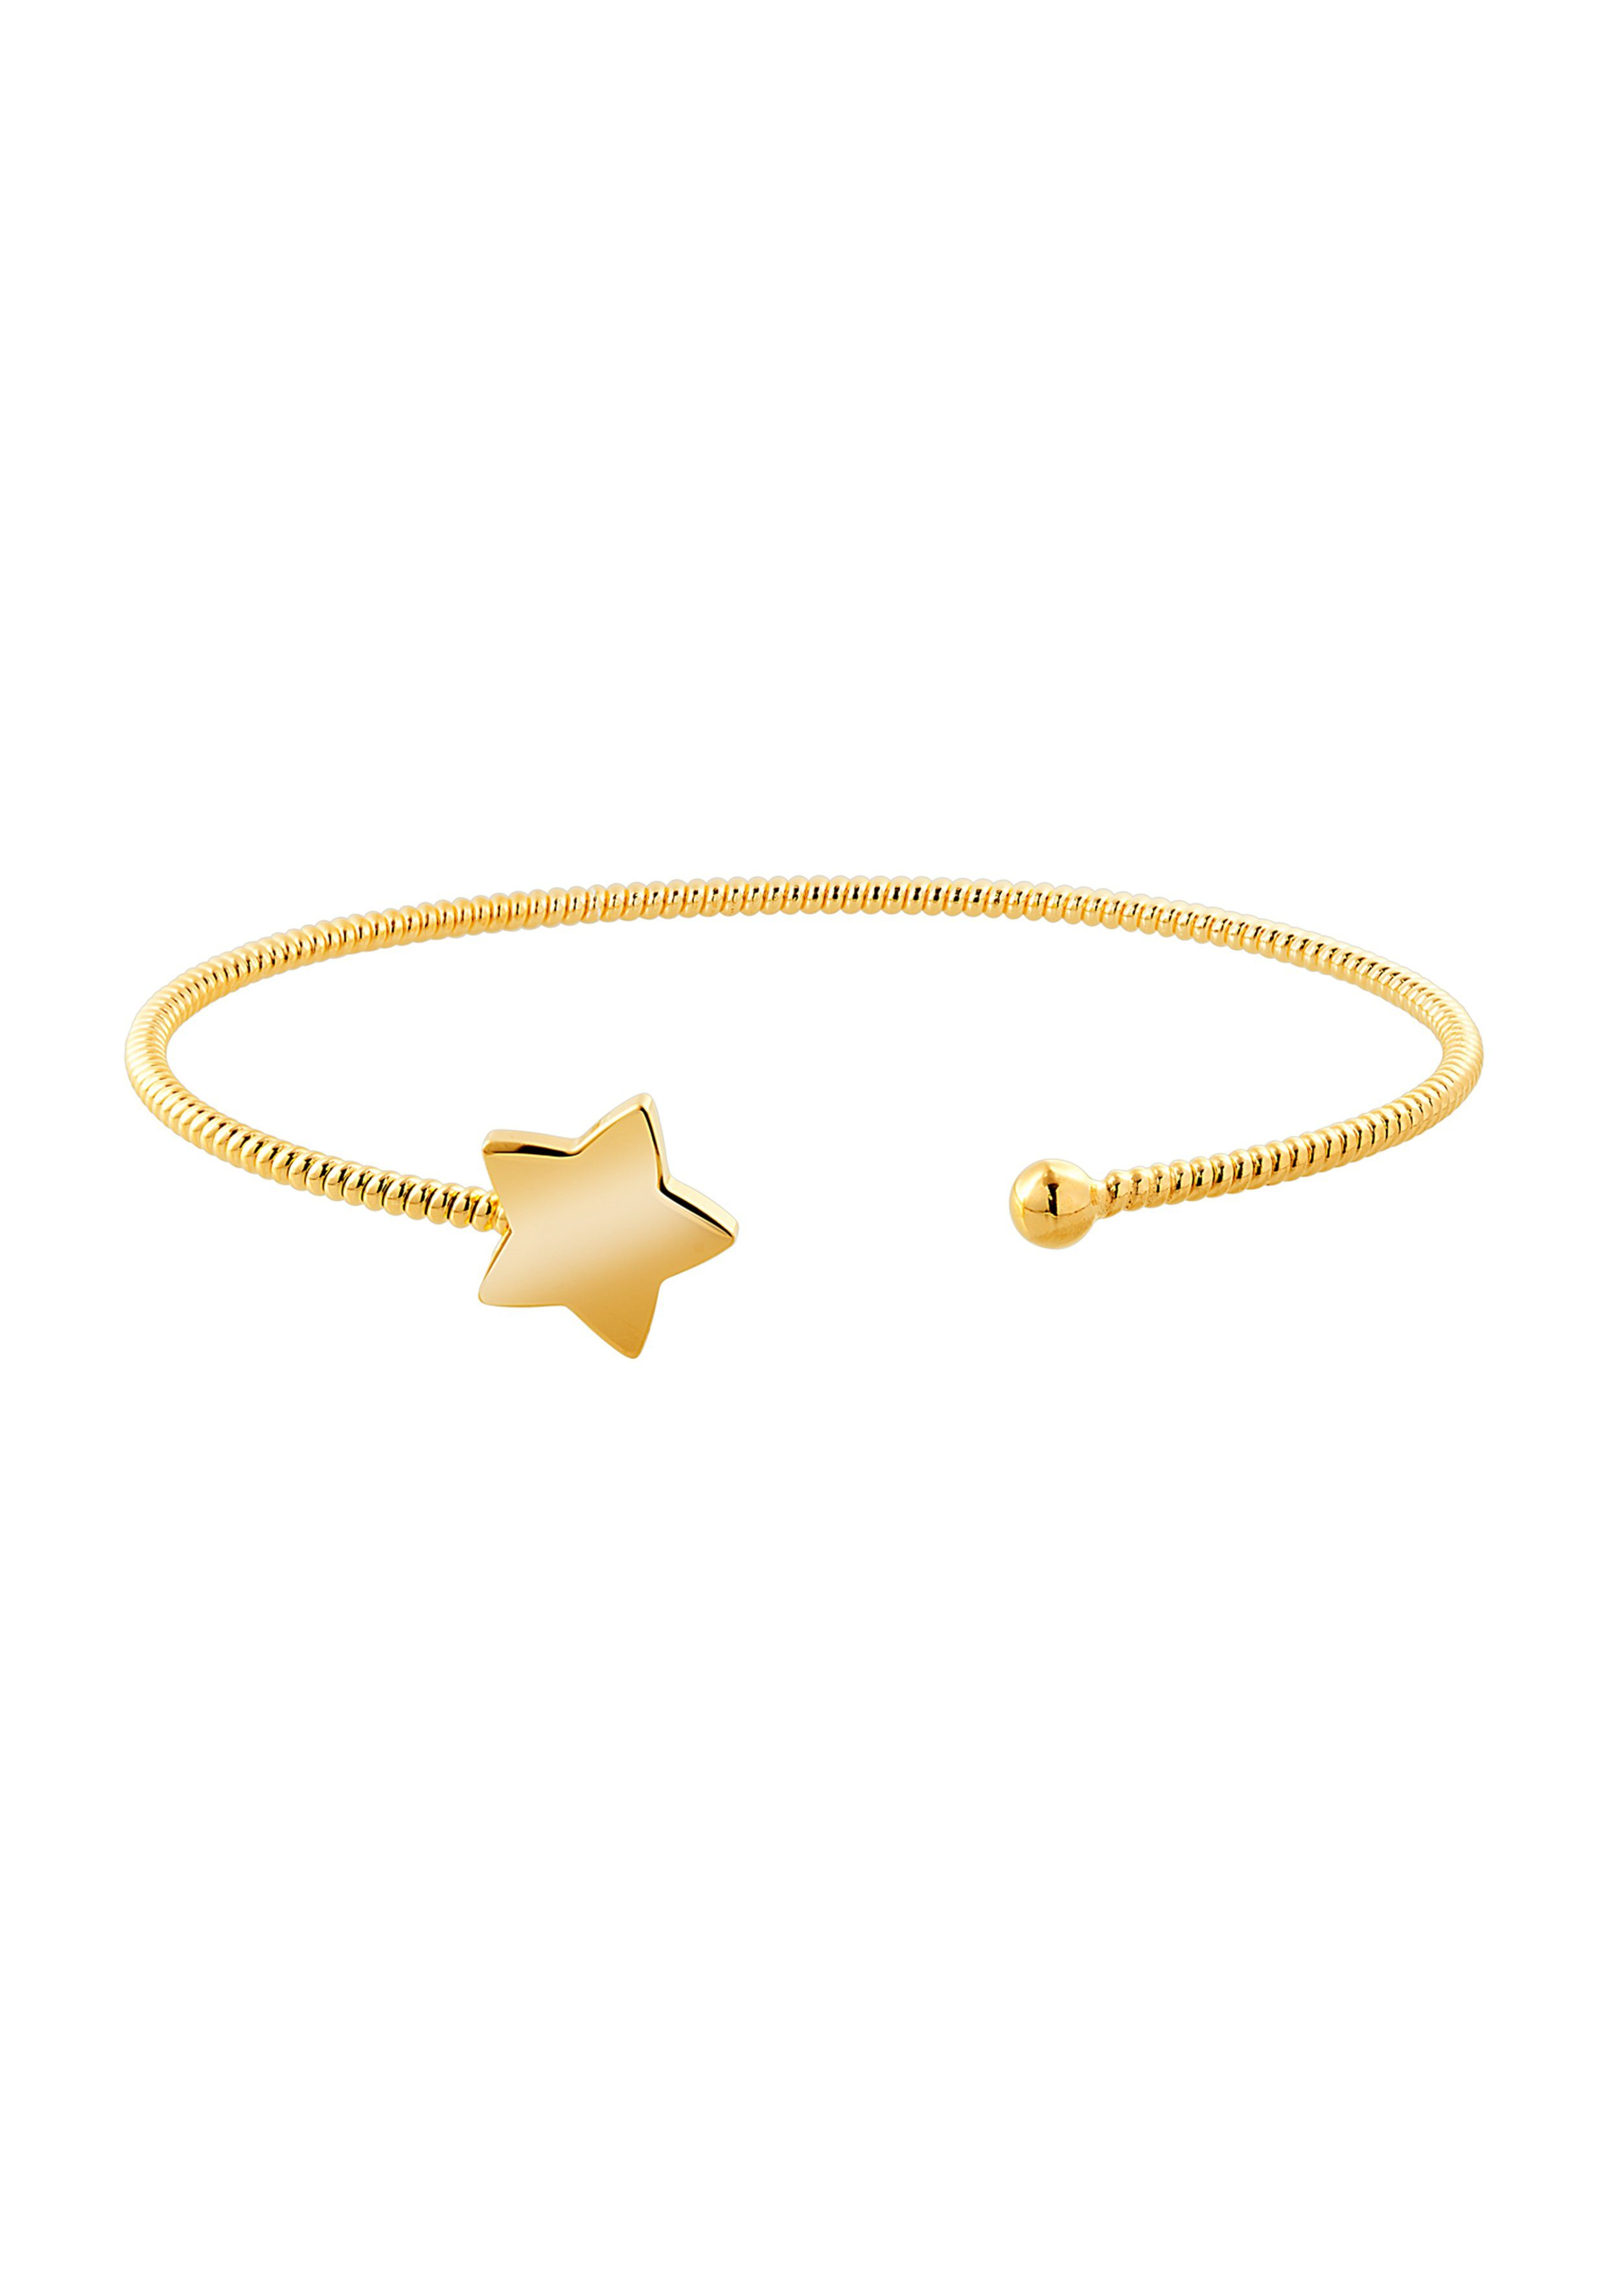 Bella Donna Jewels Armspange im Stern-Design